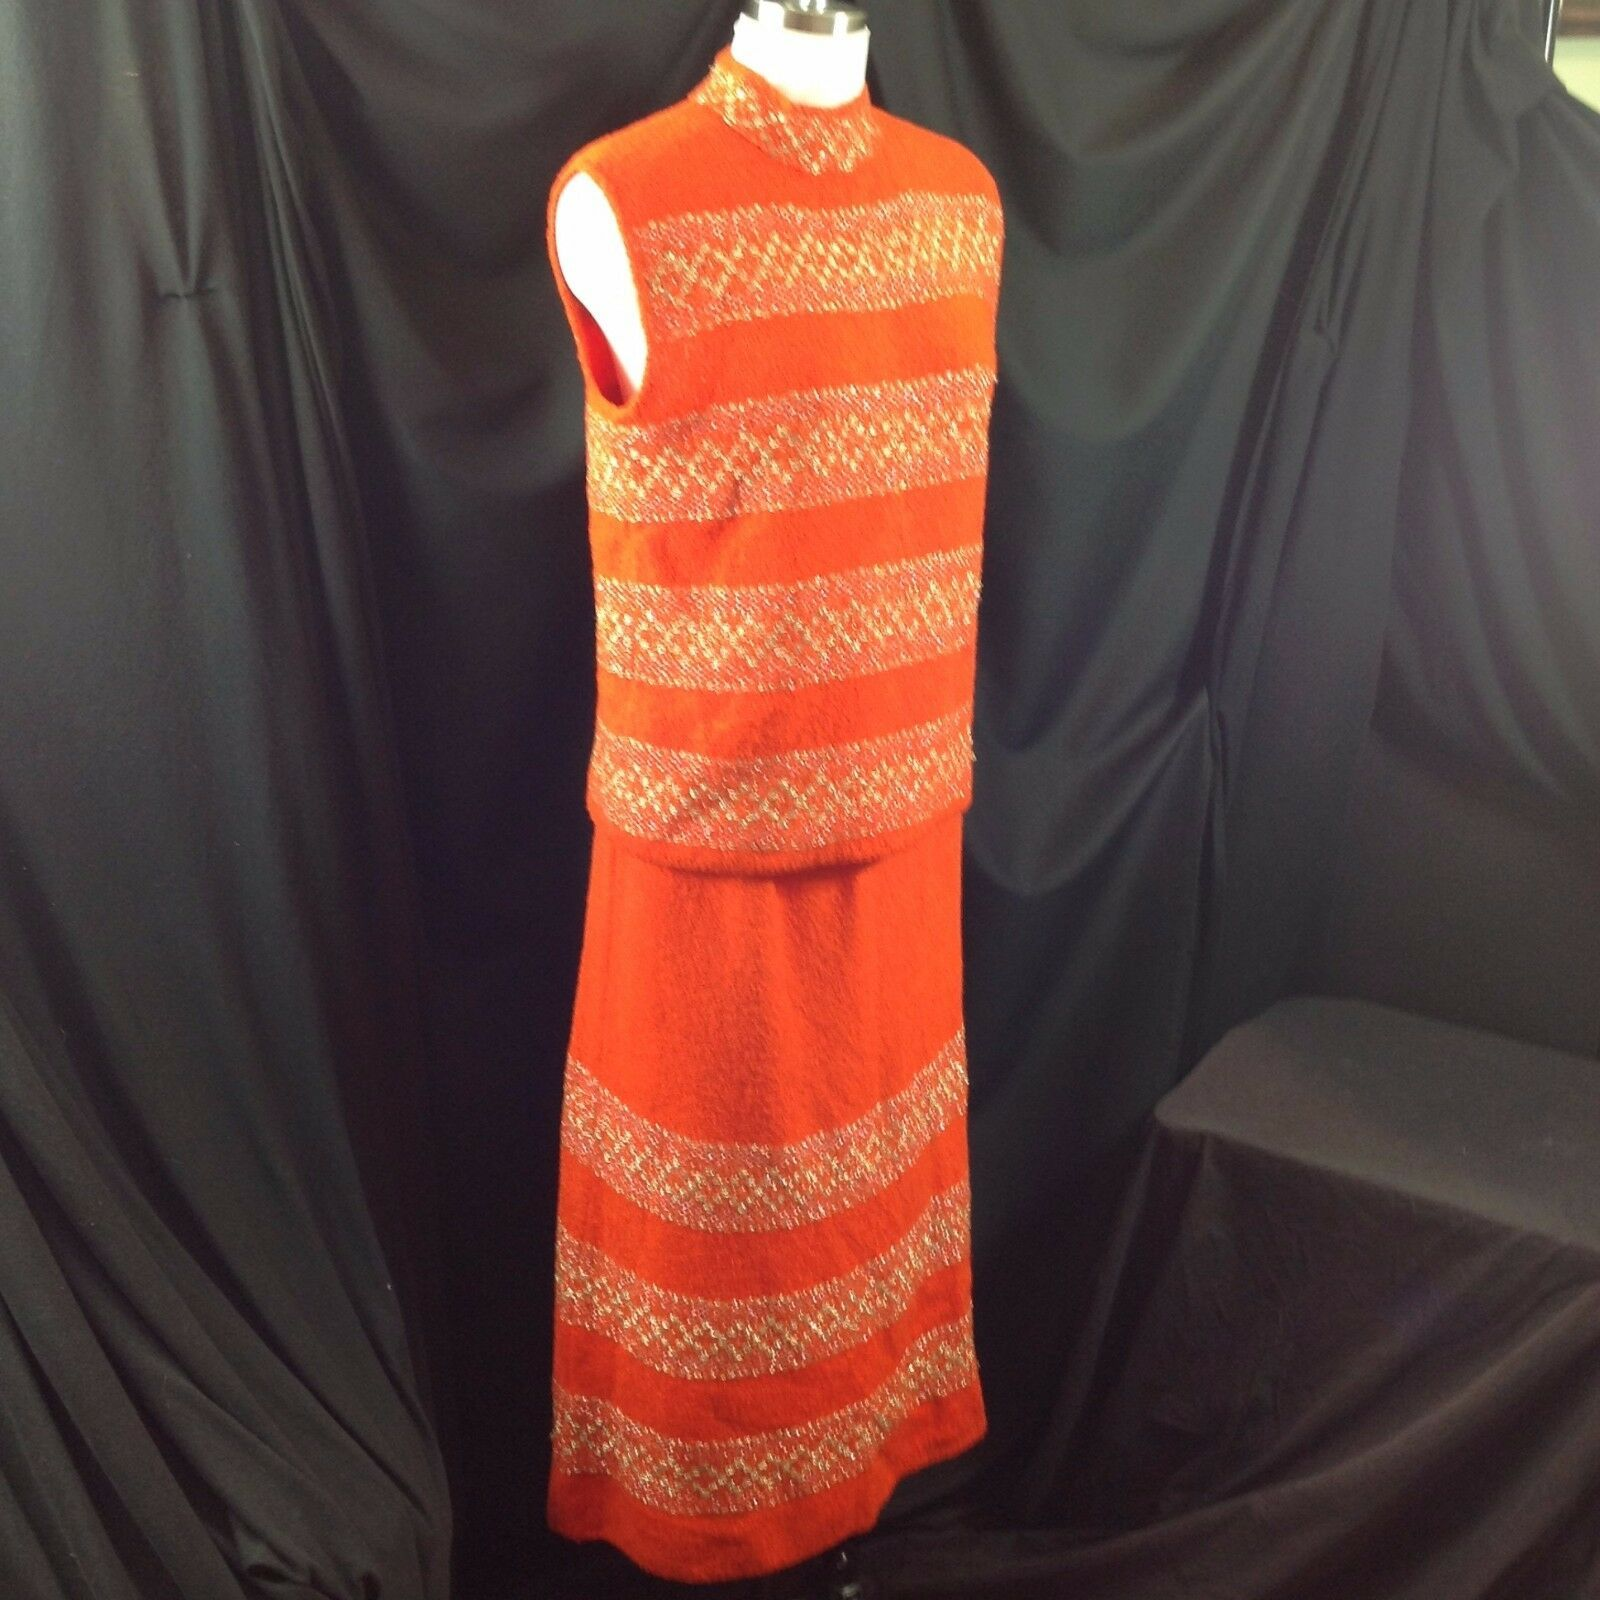 Vtg St John Knits Wiggle Groovy Hostess Sweater Dress Orange Gold Metallic M